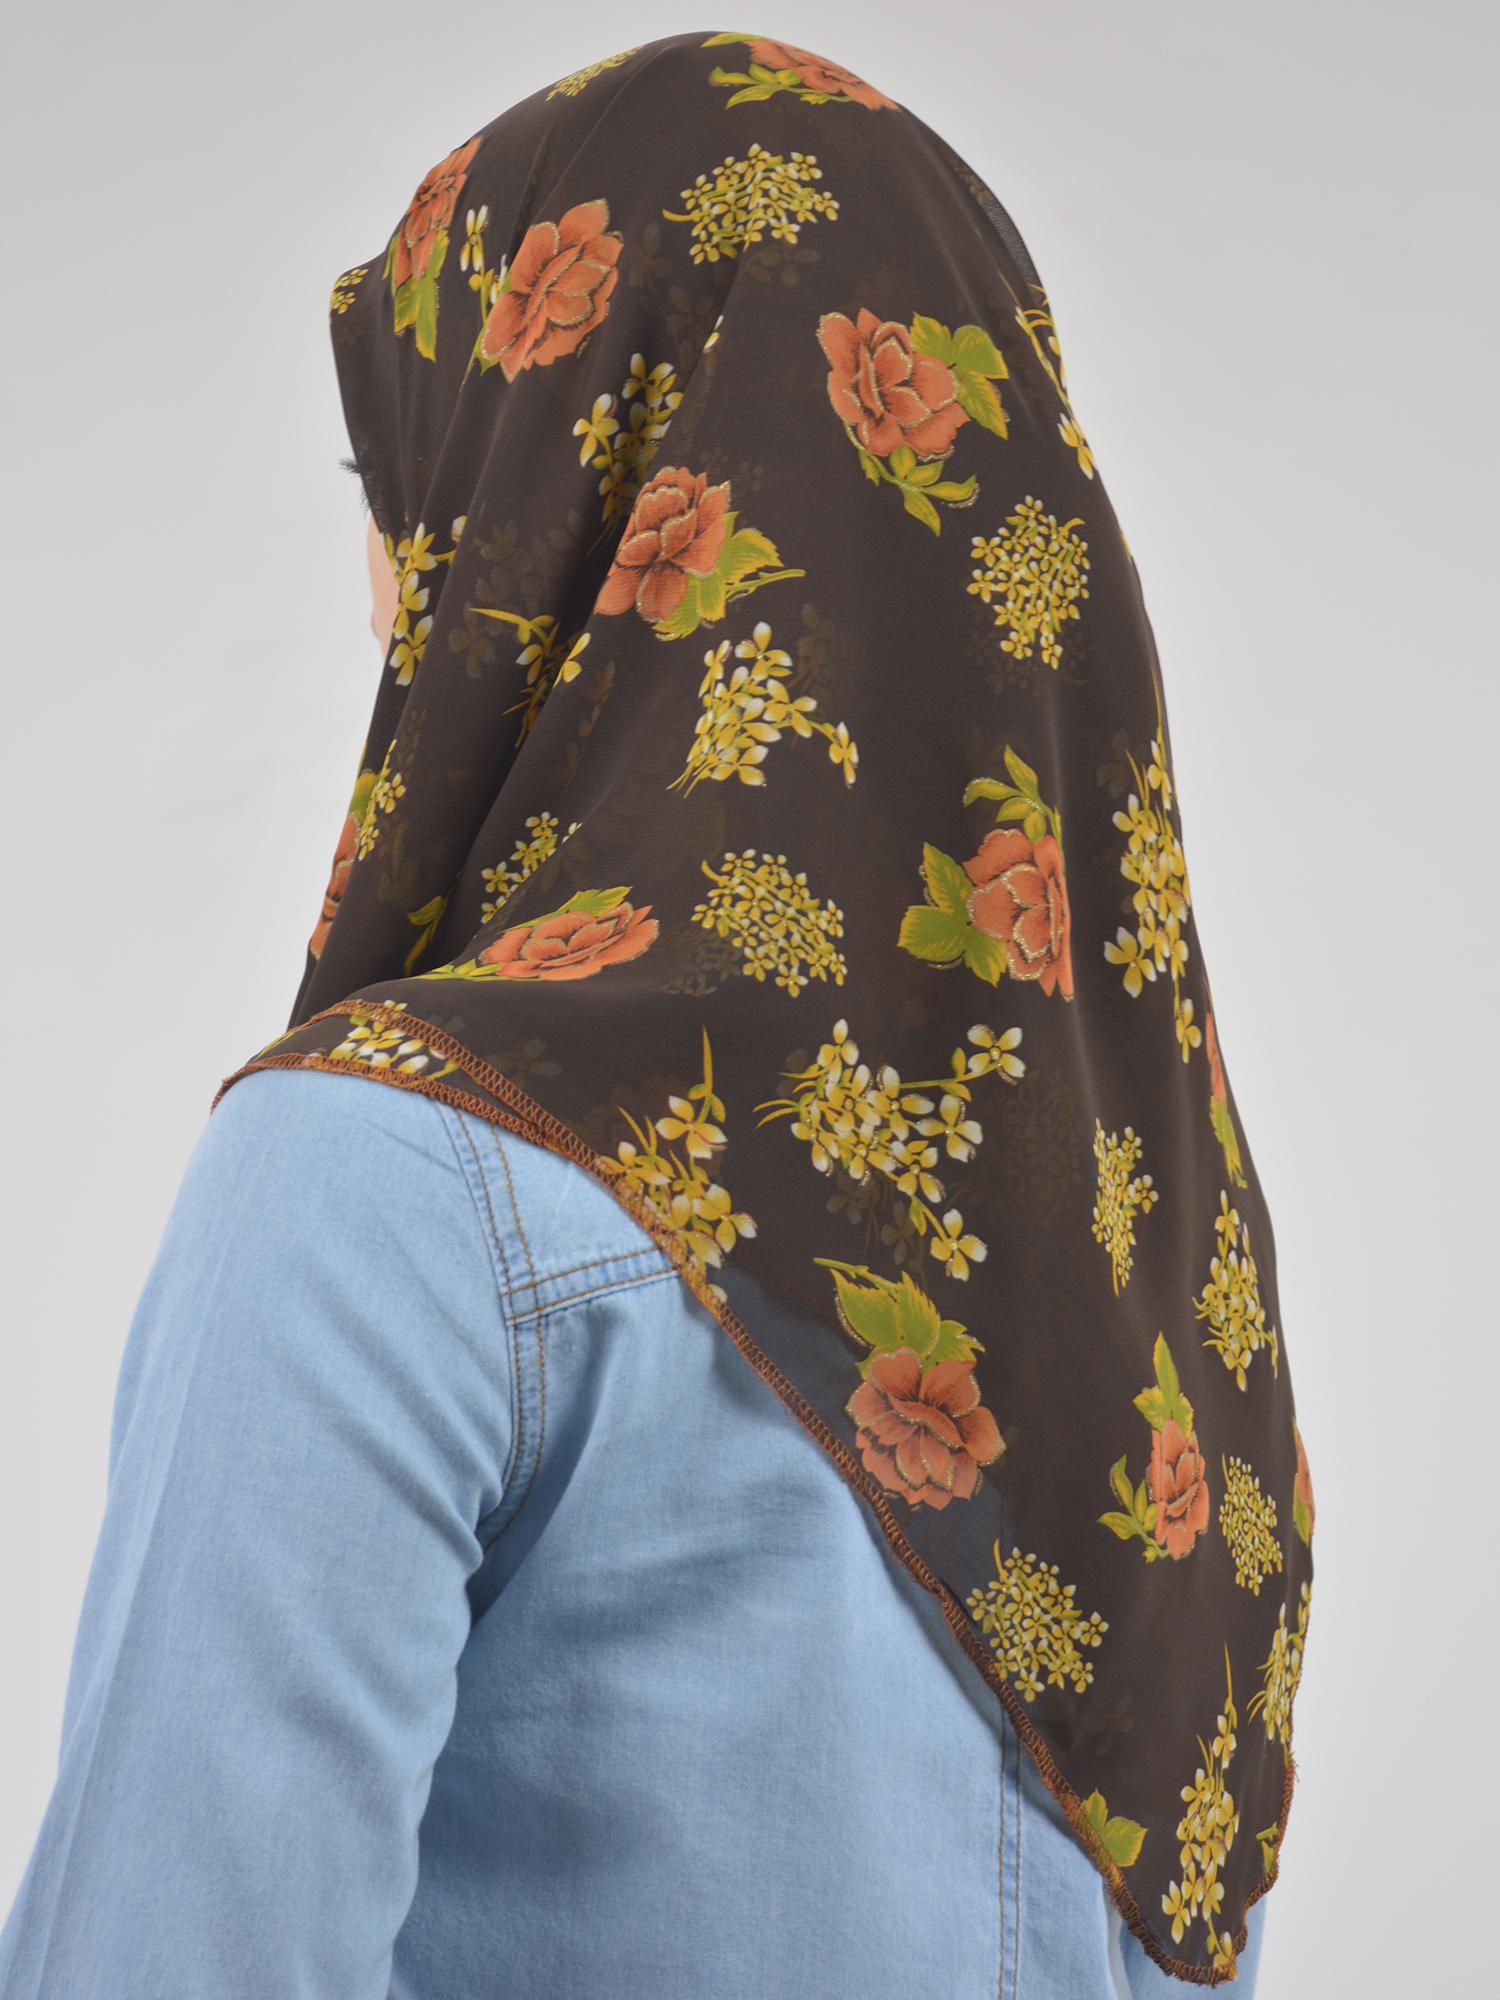 Autumn Rose Square Hijab HI2124 (2)